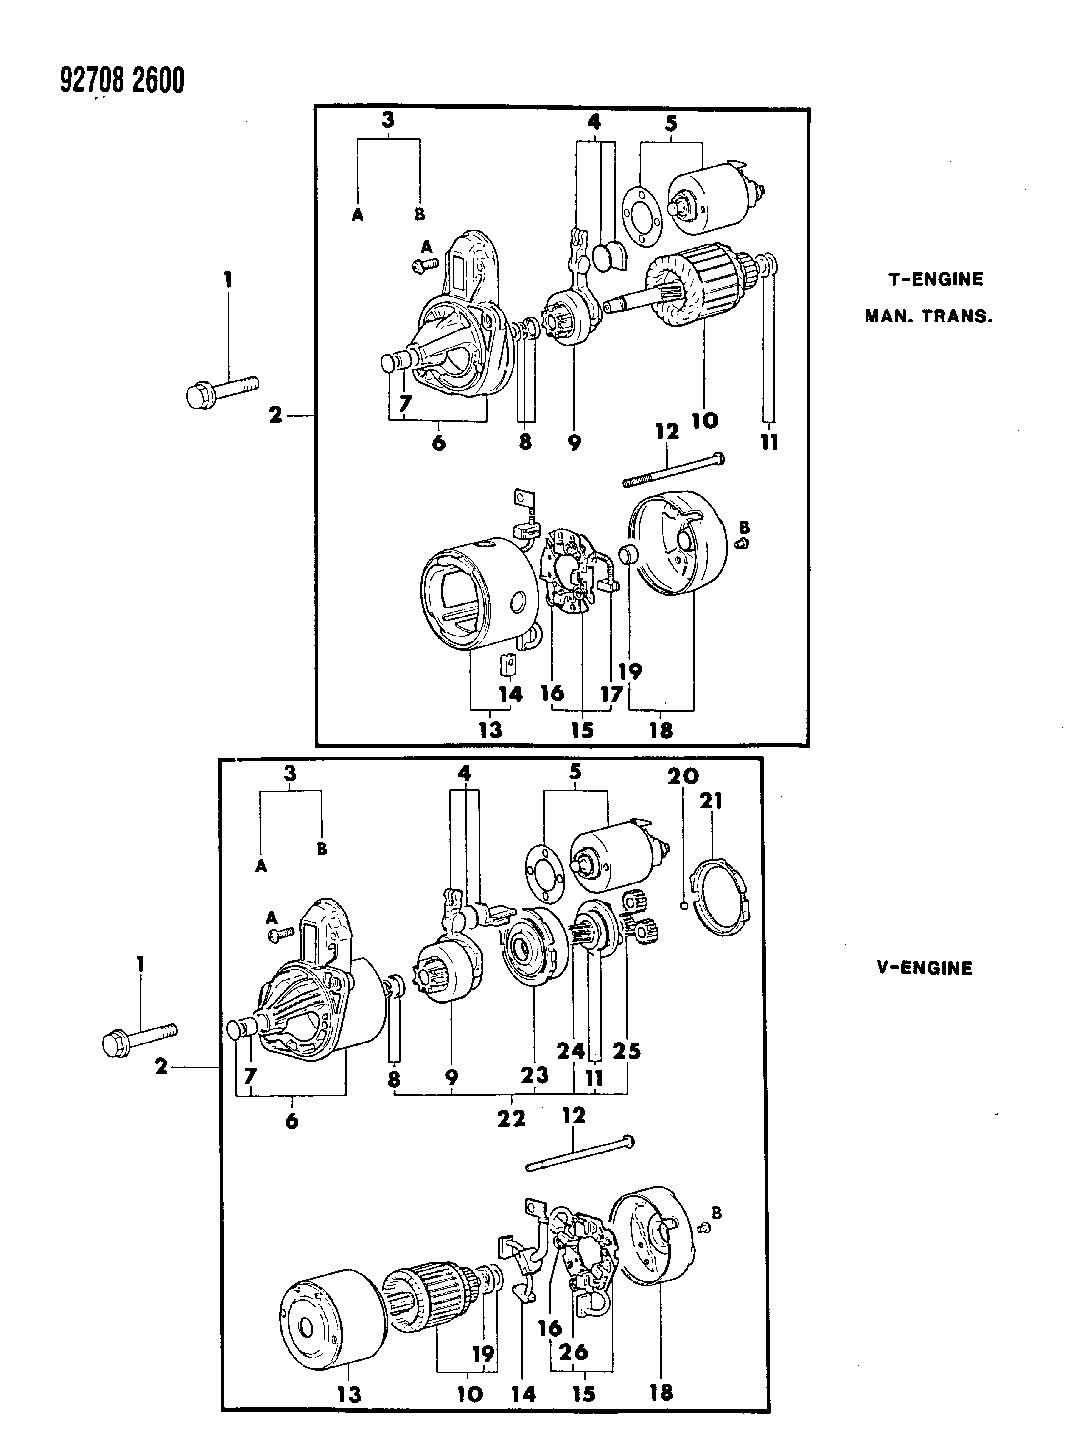 1992 Dodge D50 Wiring Diagram